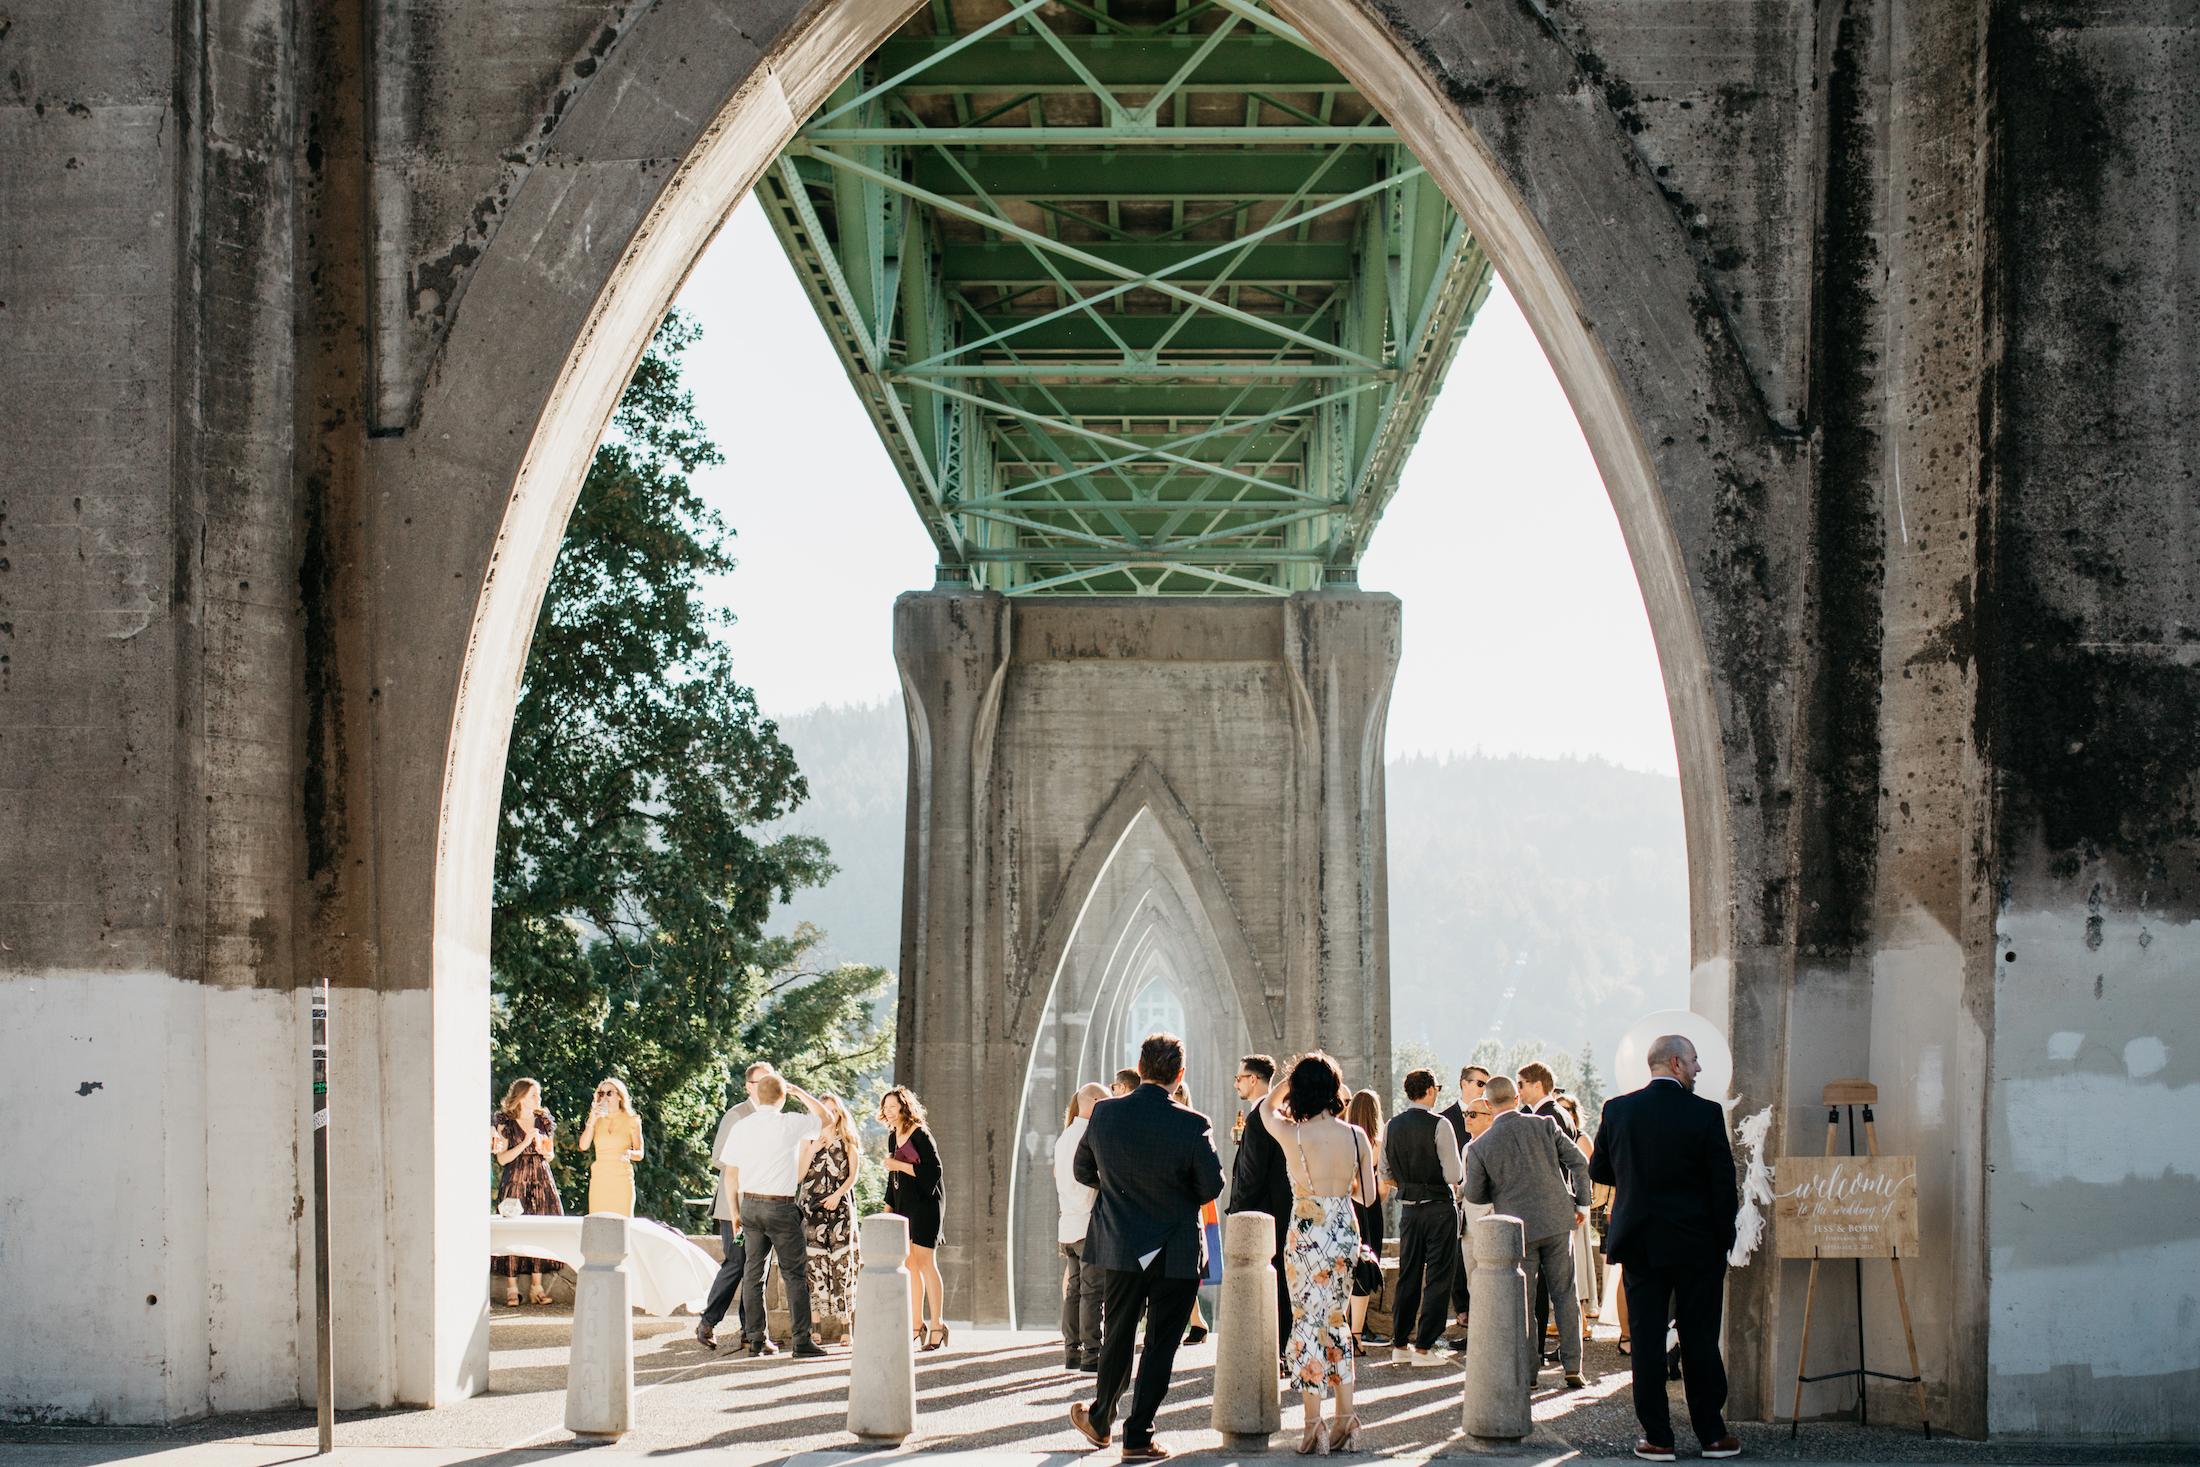 cathedral-park-portland-wedding-photographer-baker-building-wedding363.jpg